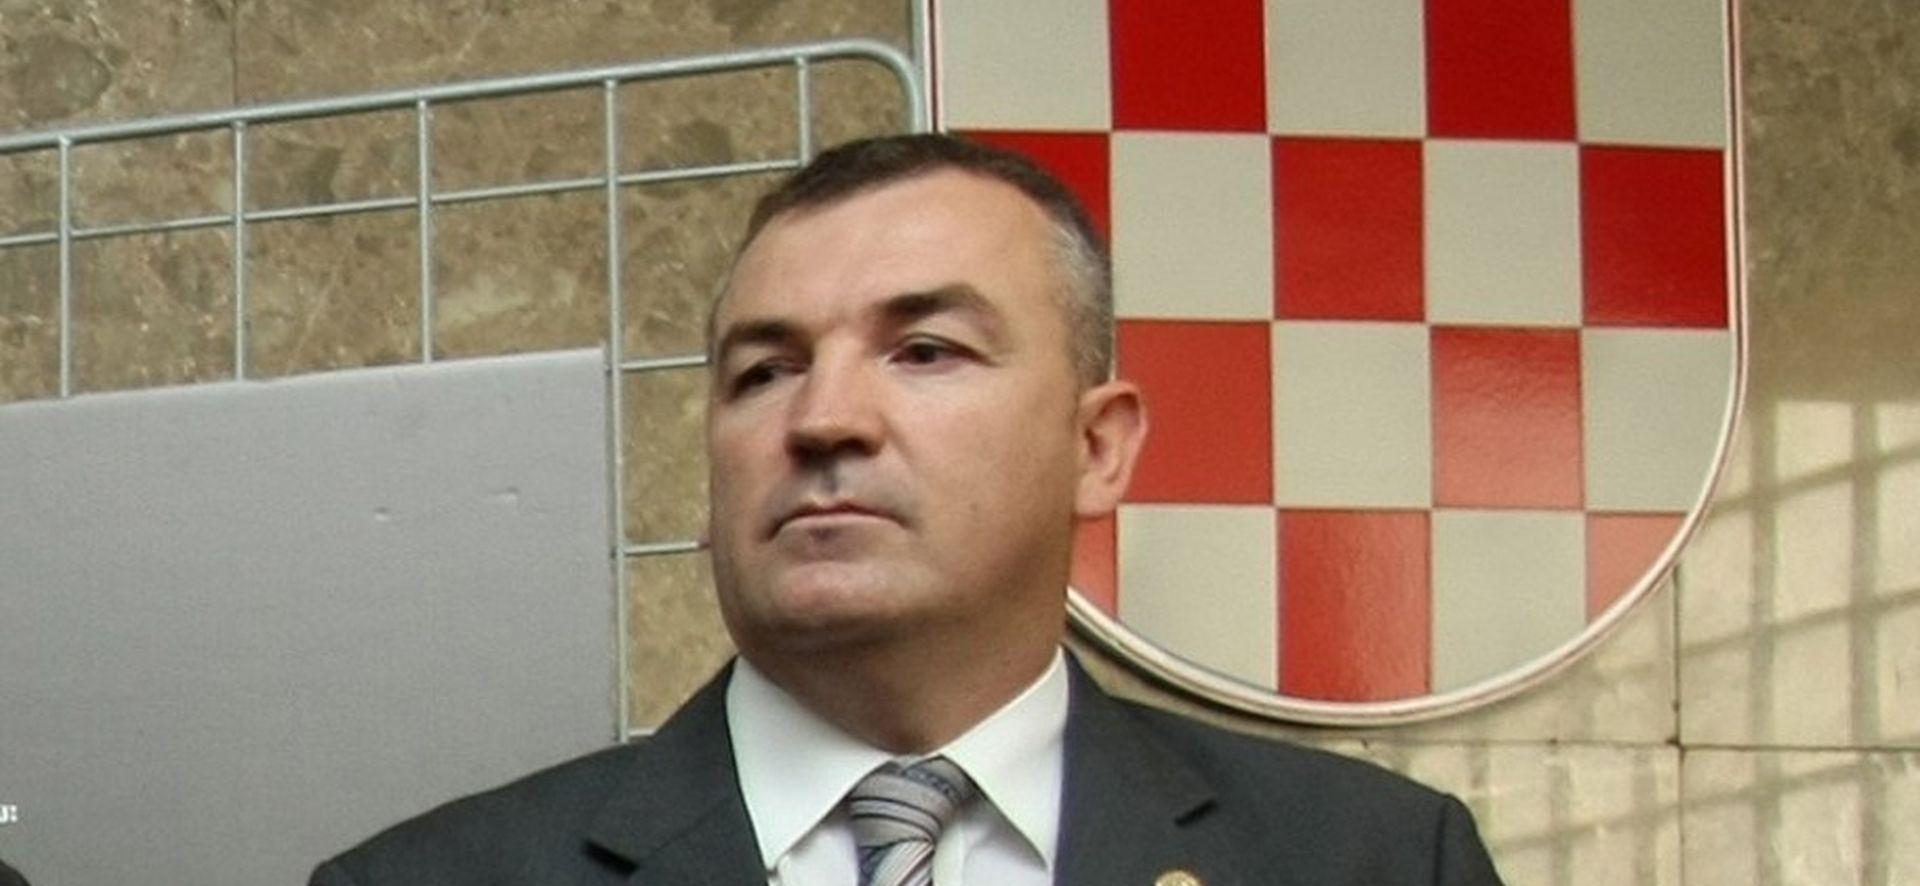 NOVI ŠEF POLICIJE Tko je Nikola Milina?